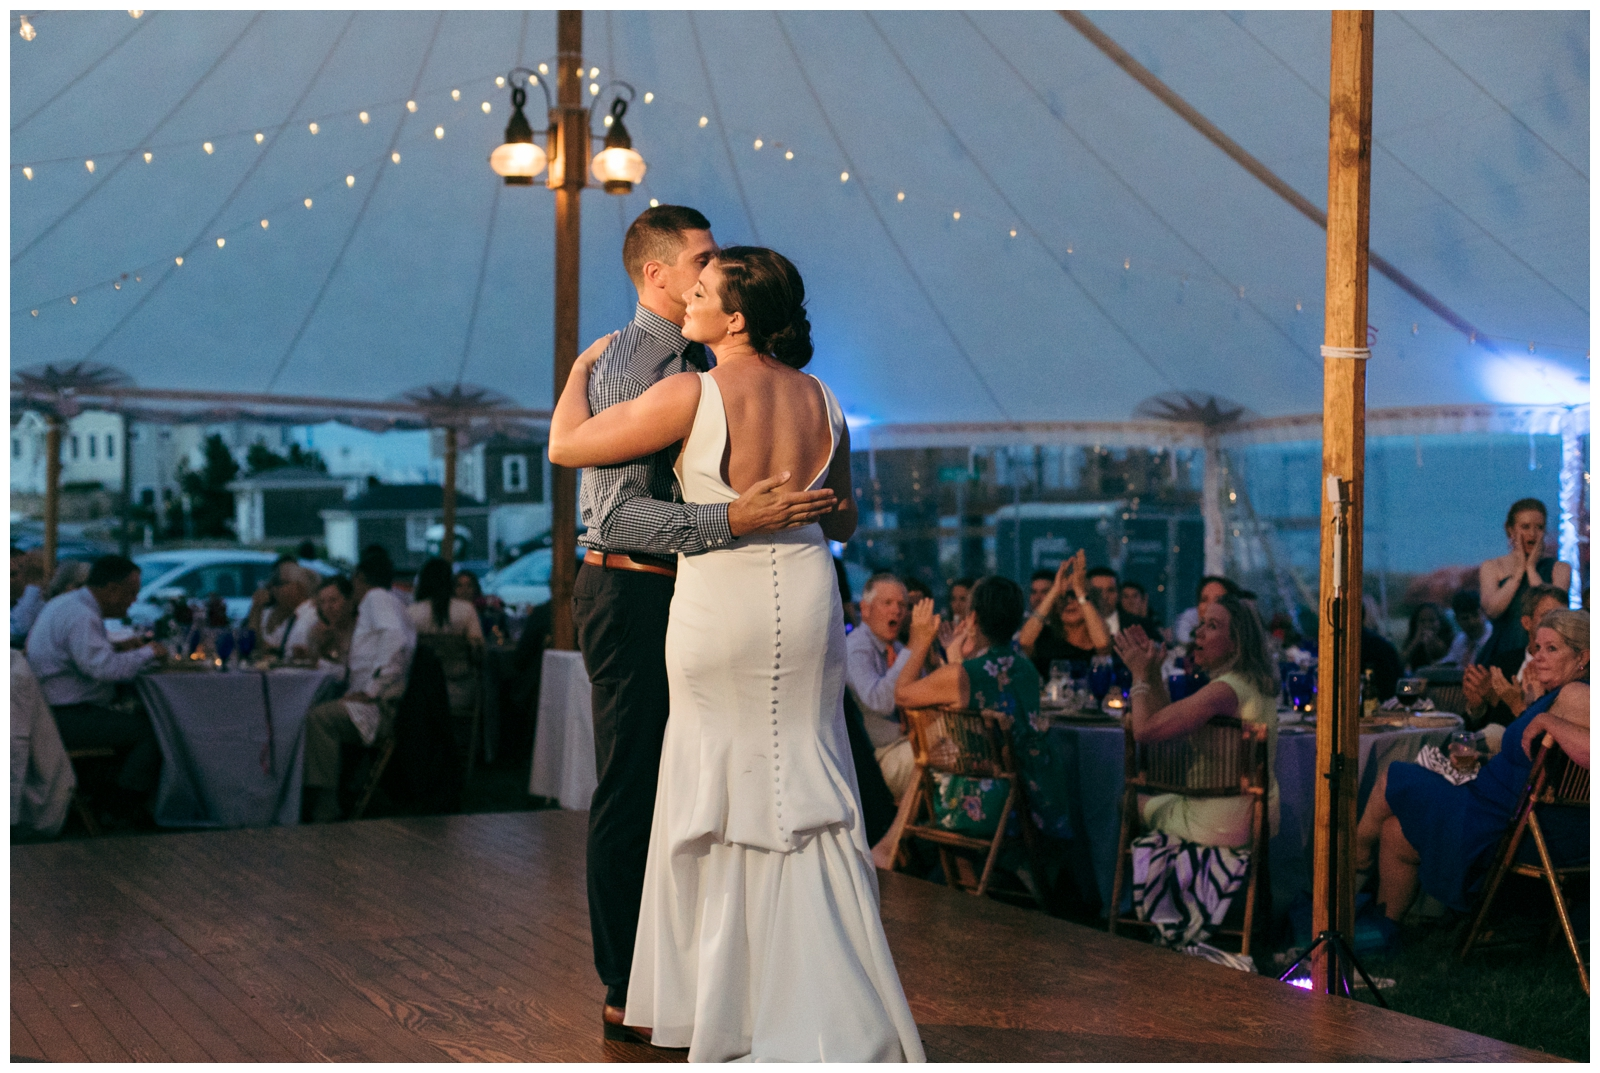 Bailey-Q-Photo-Backyard-Wedding-South-Shore-Boston-Wedding-Photographer-113.jpg